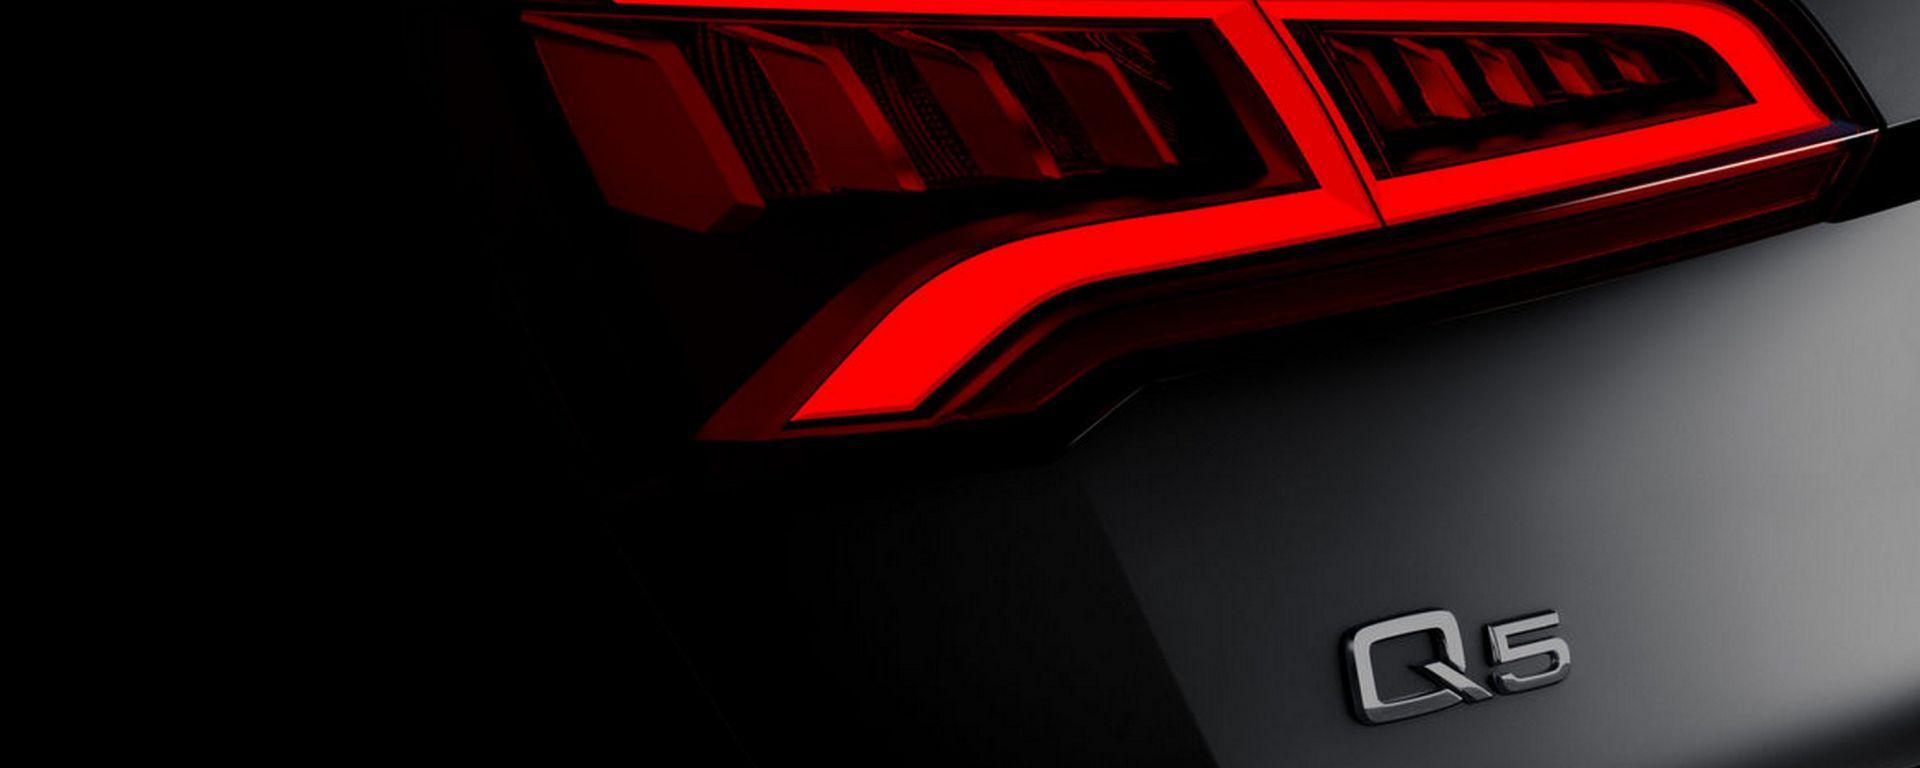 Audi Q5: confermato, a Parigi ci sarà